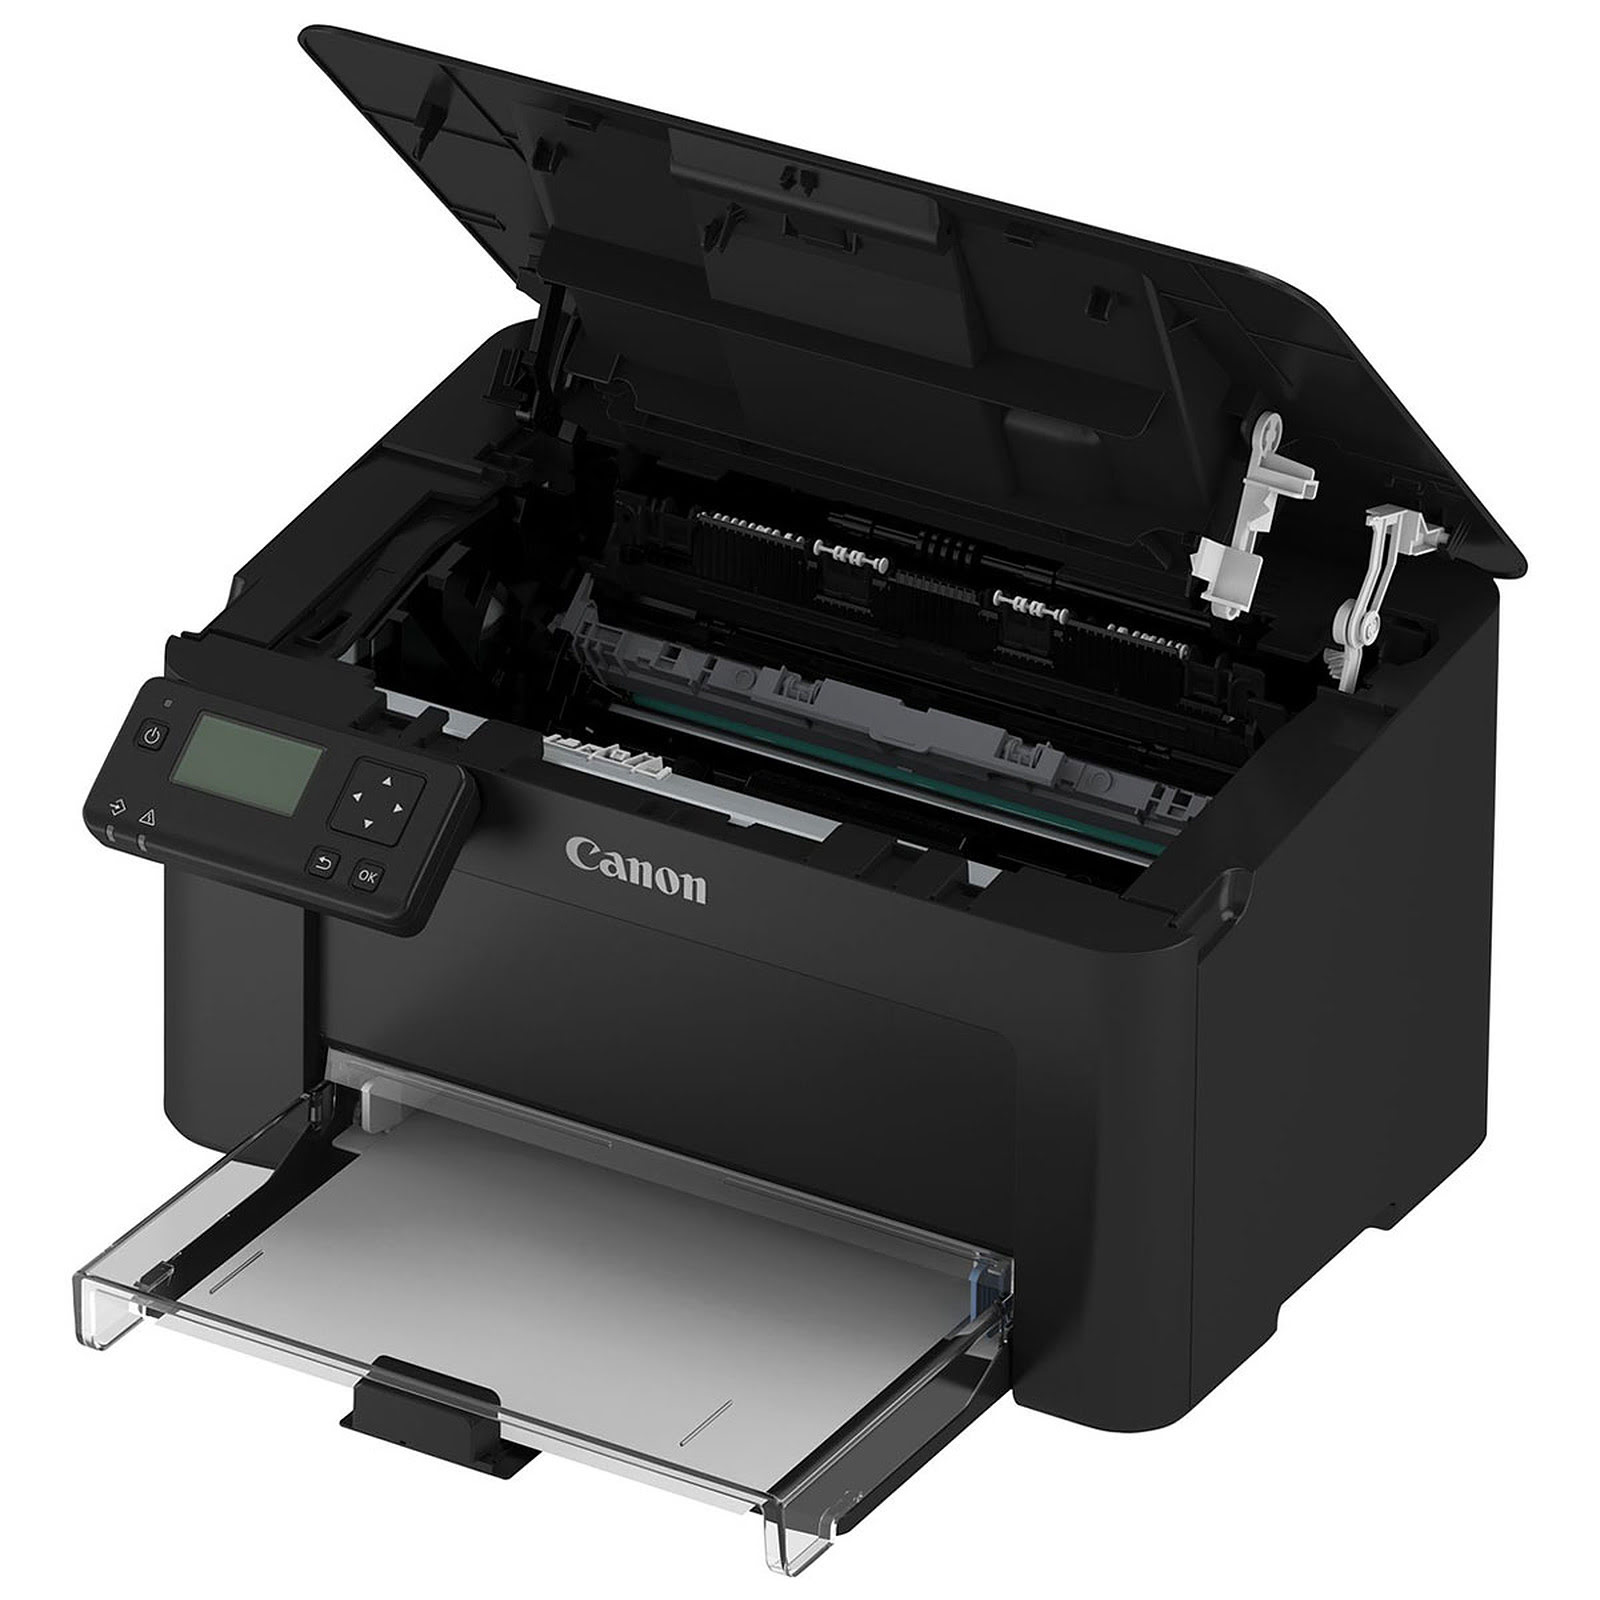 Imprimante Canon I-SENSYS LBP113W - Cybertek.fr - 2